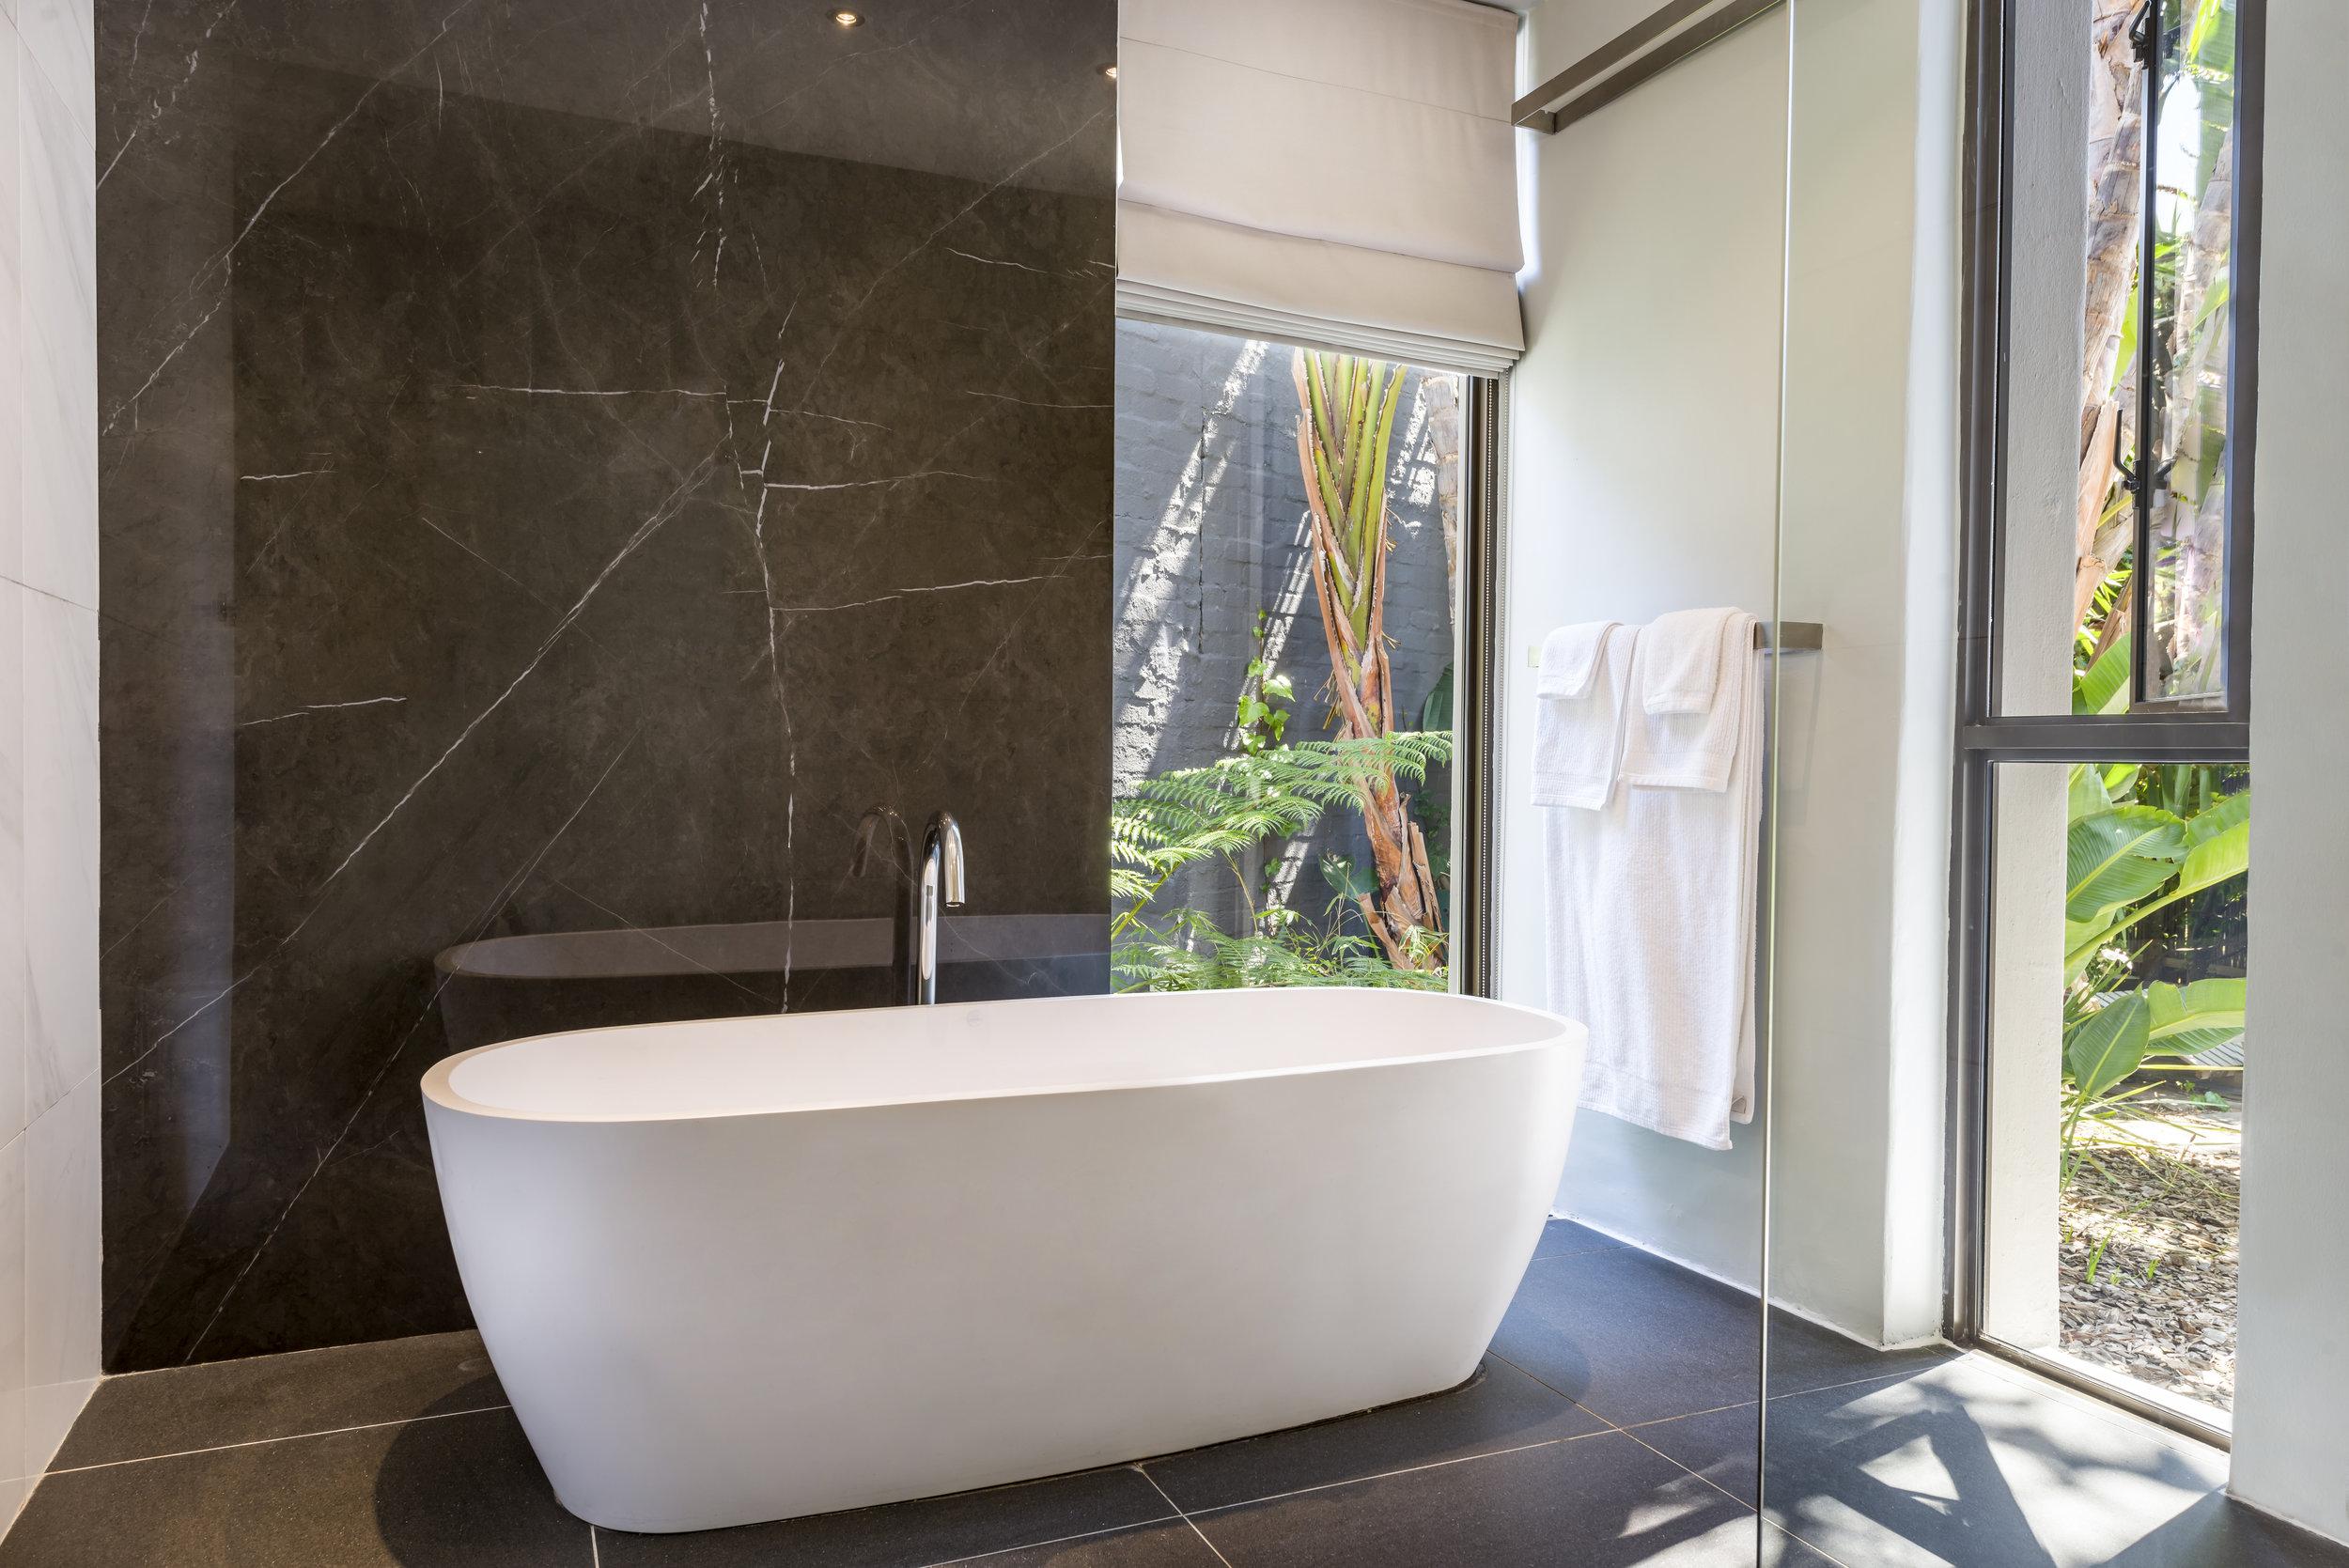 Kensington Place Superior room bathroom 2.jpg